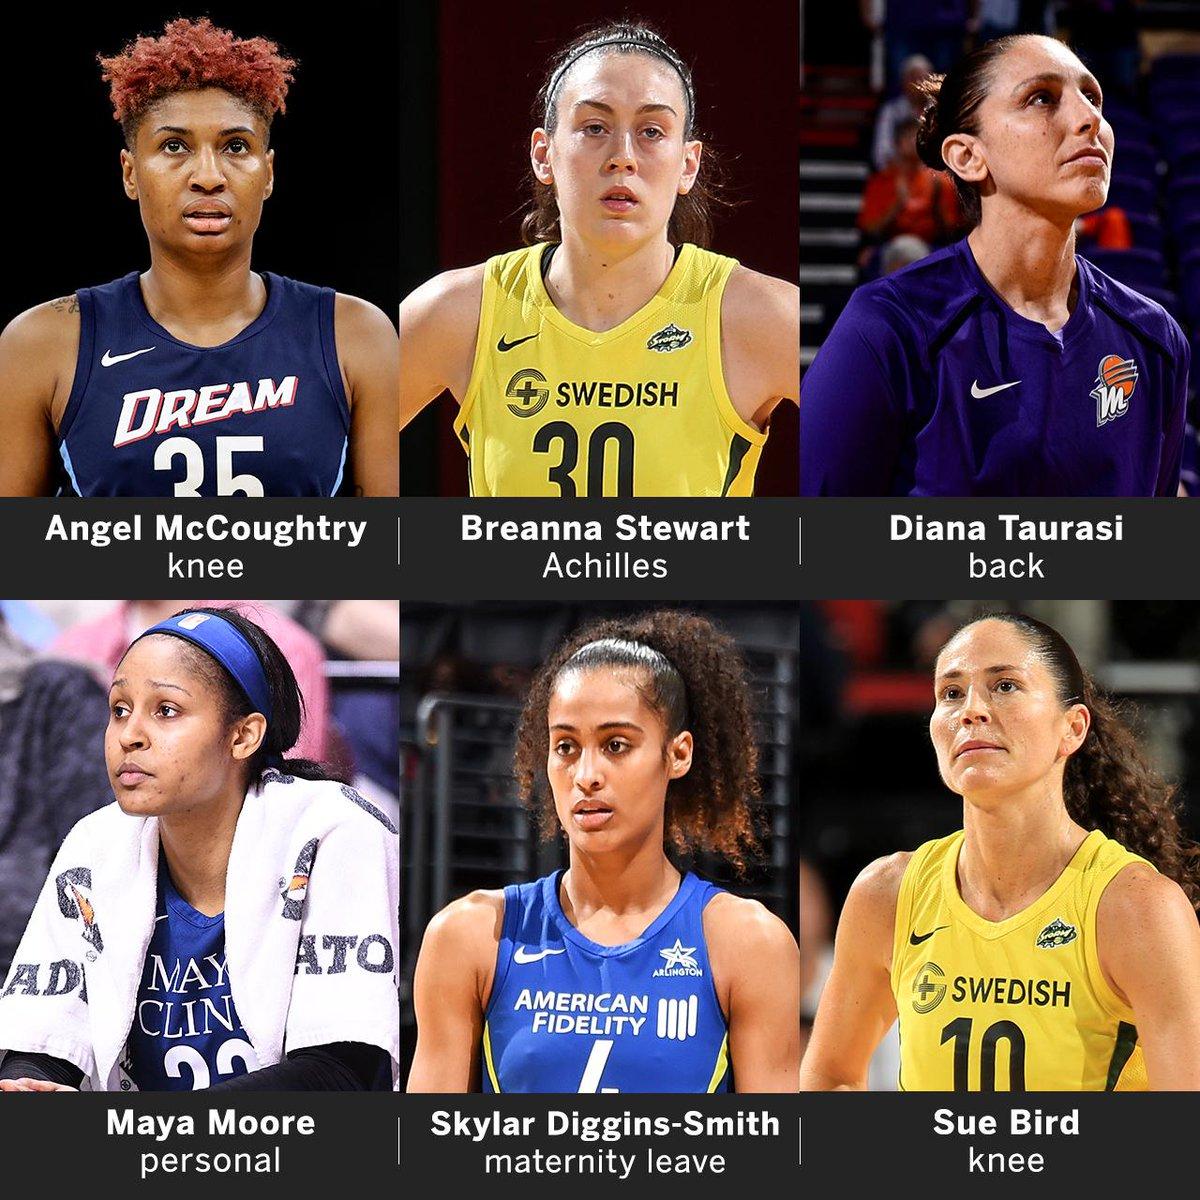 Sadness and Sorrow 😢💔 #WNBA #WnbaFr